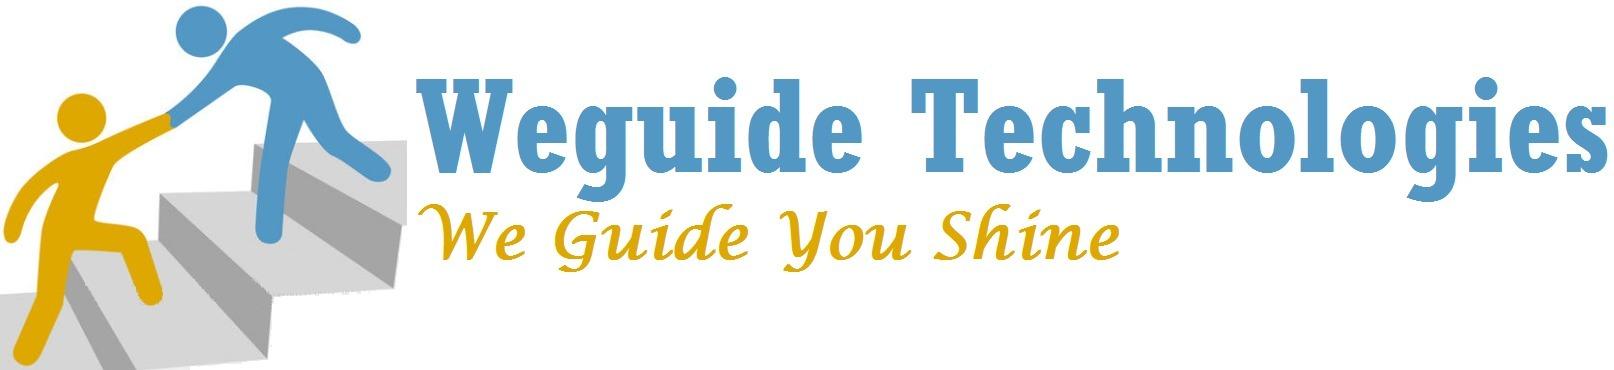 Weguide technologies (@weguidetechnolgies) Cover Image